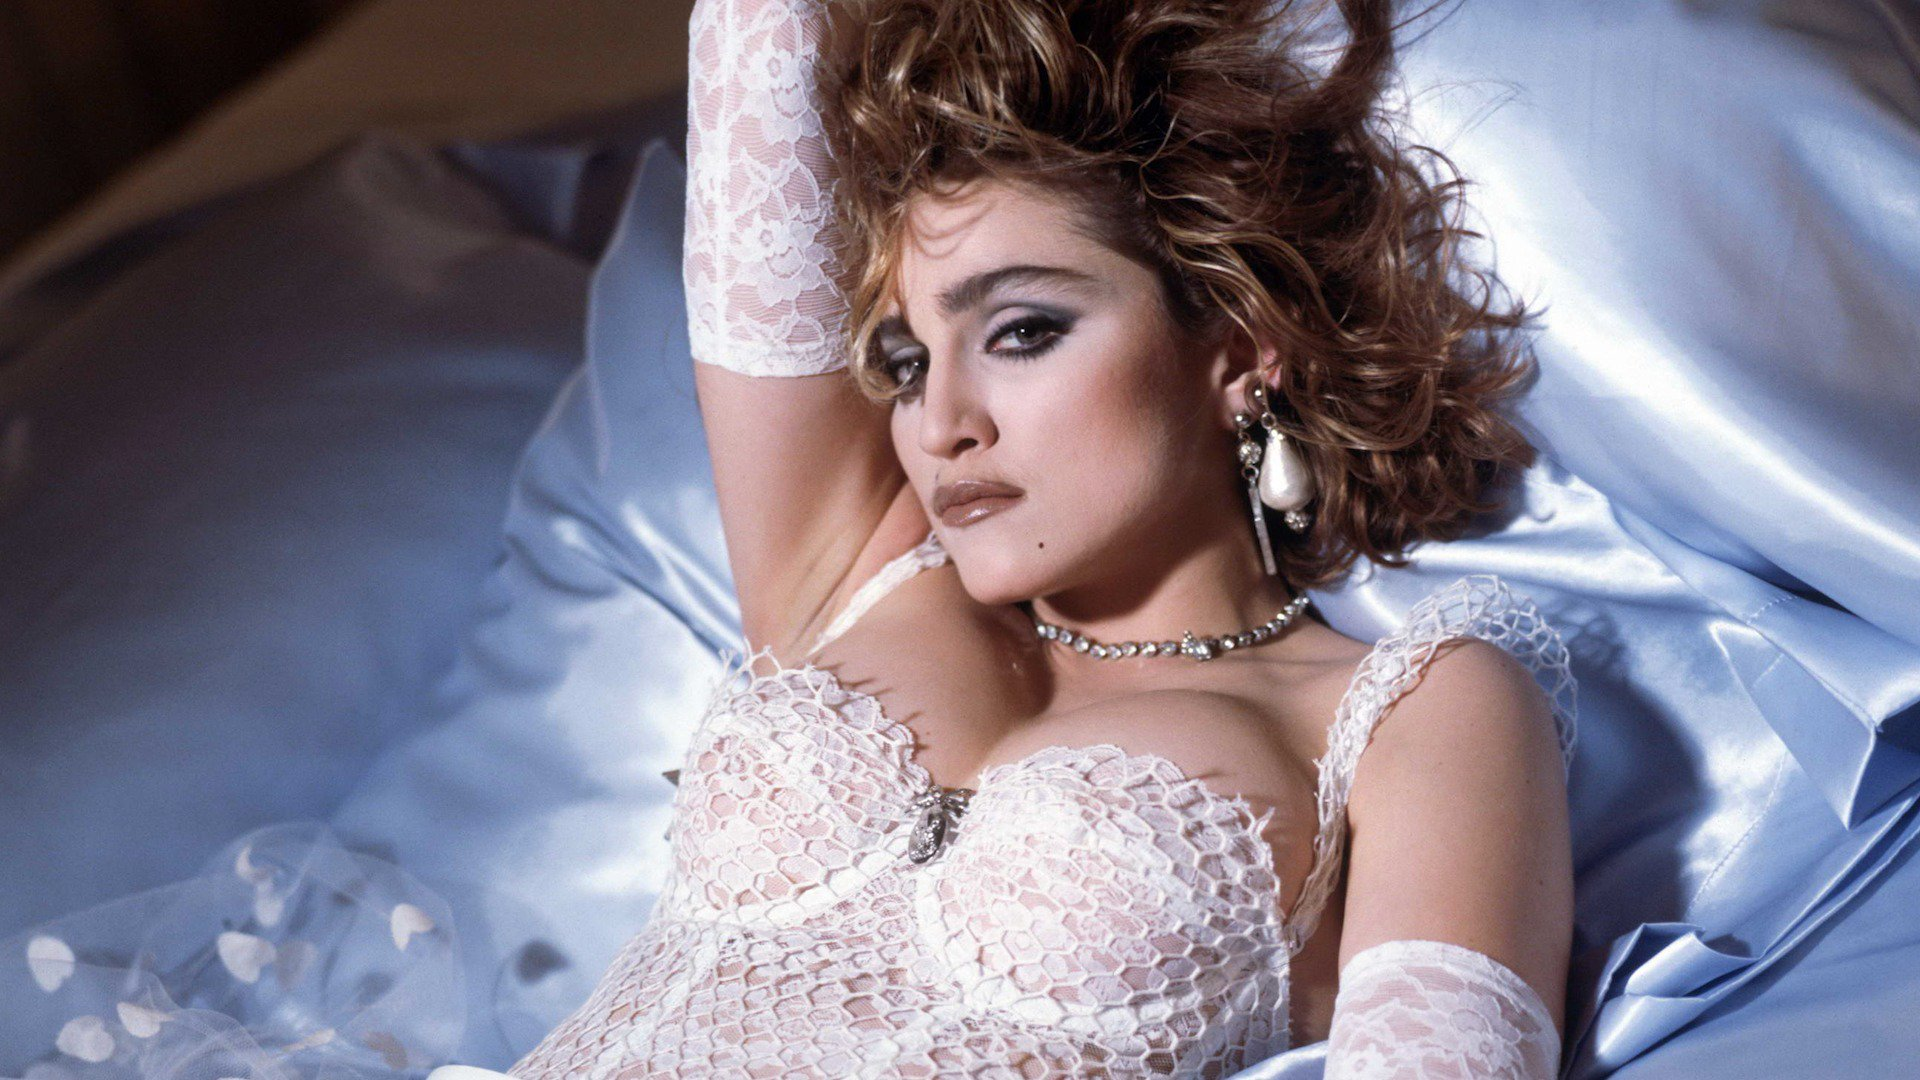 Happy birthday to the Queen of Pop,